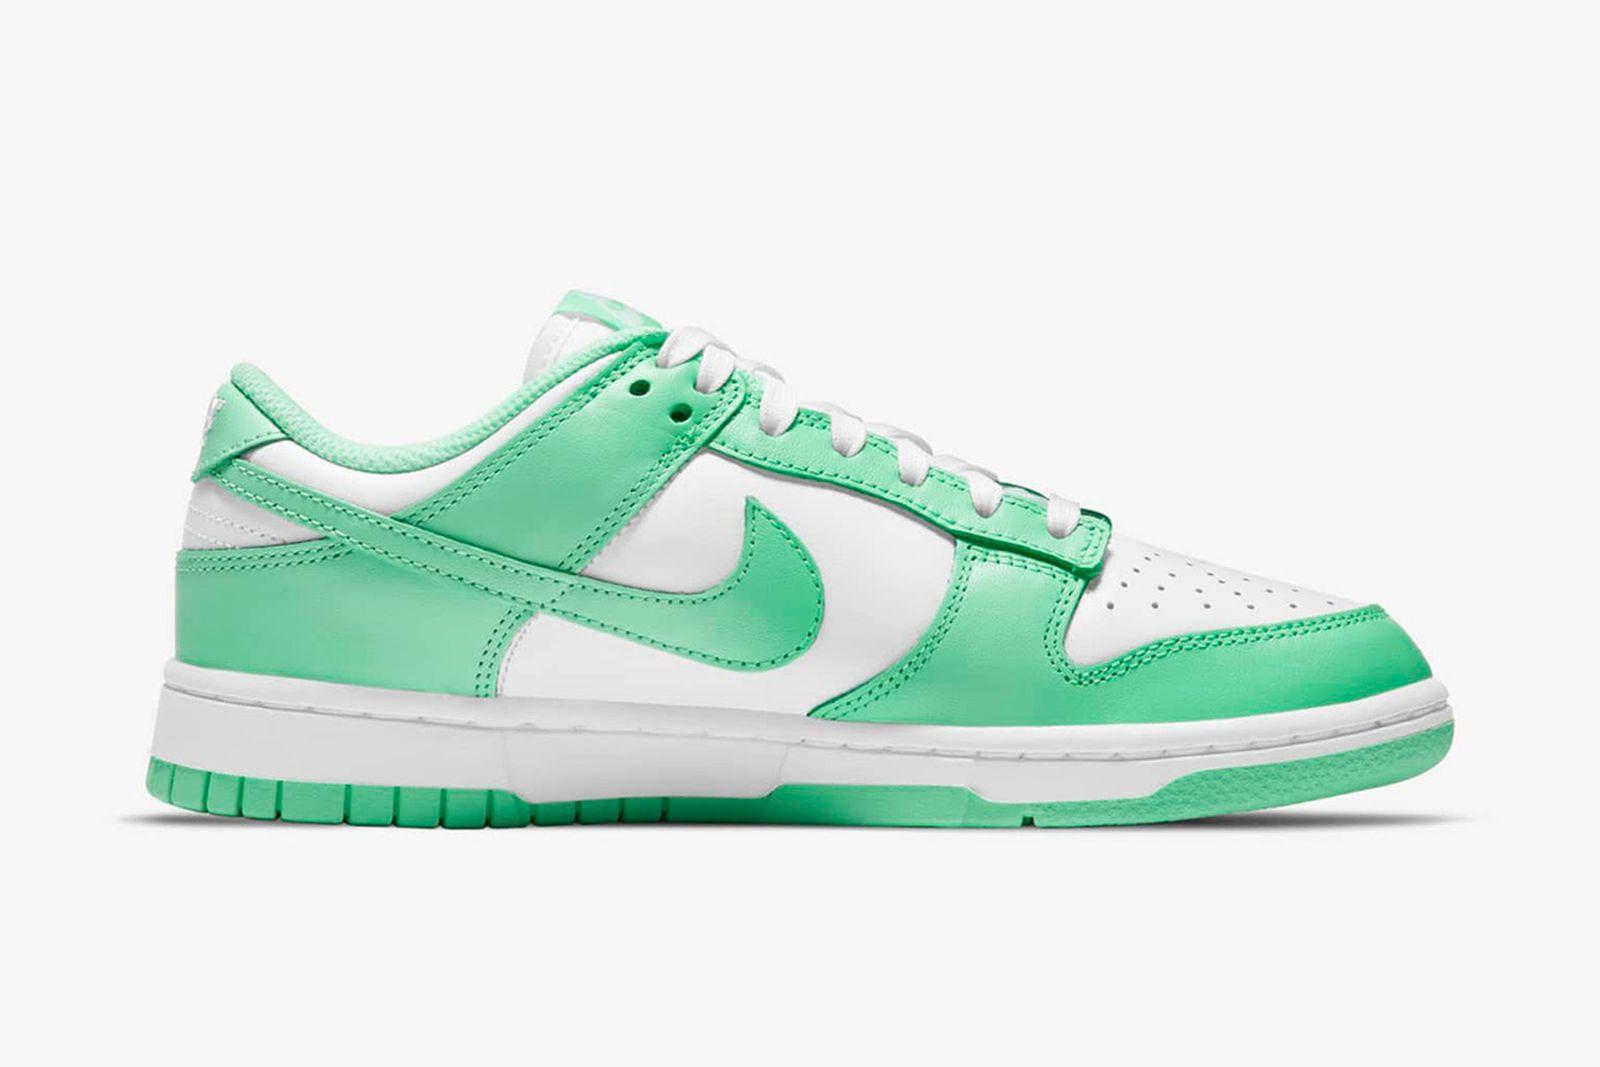 nike-dunk-low-green-glow-release-date-price-03